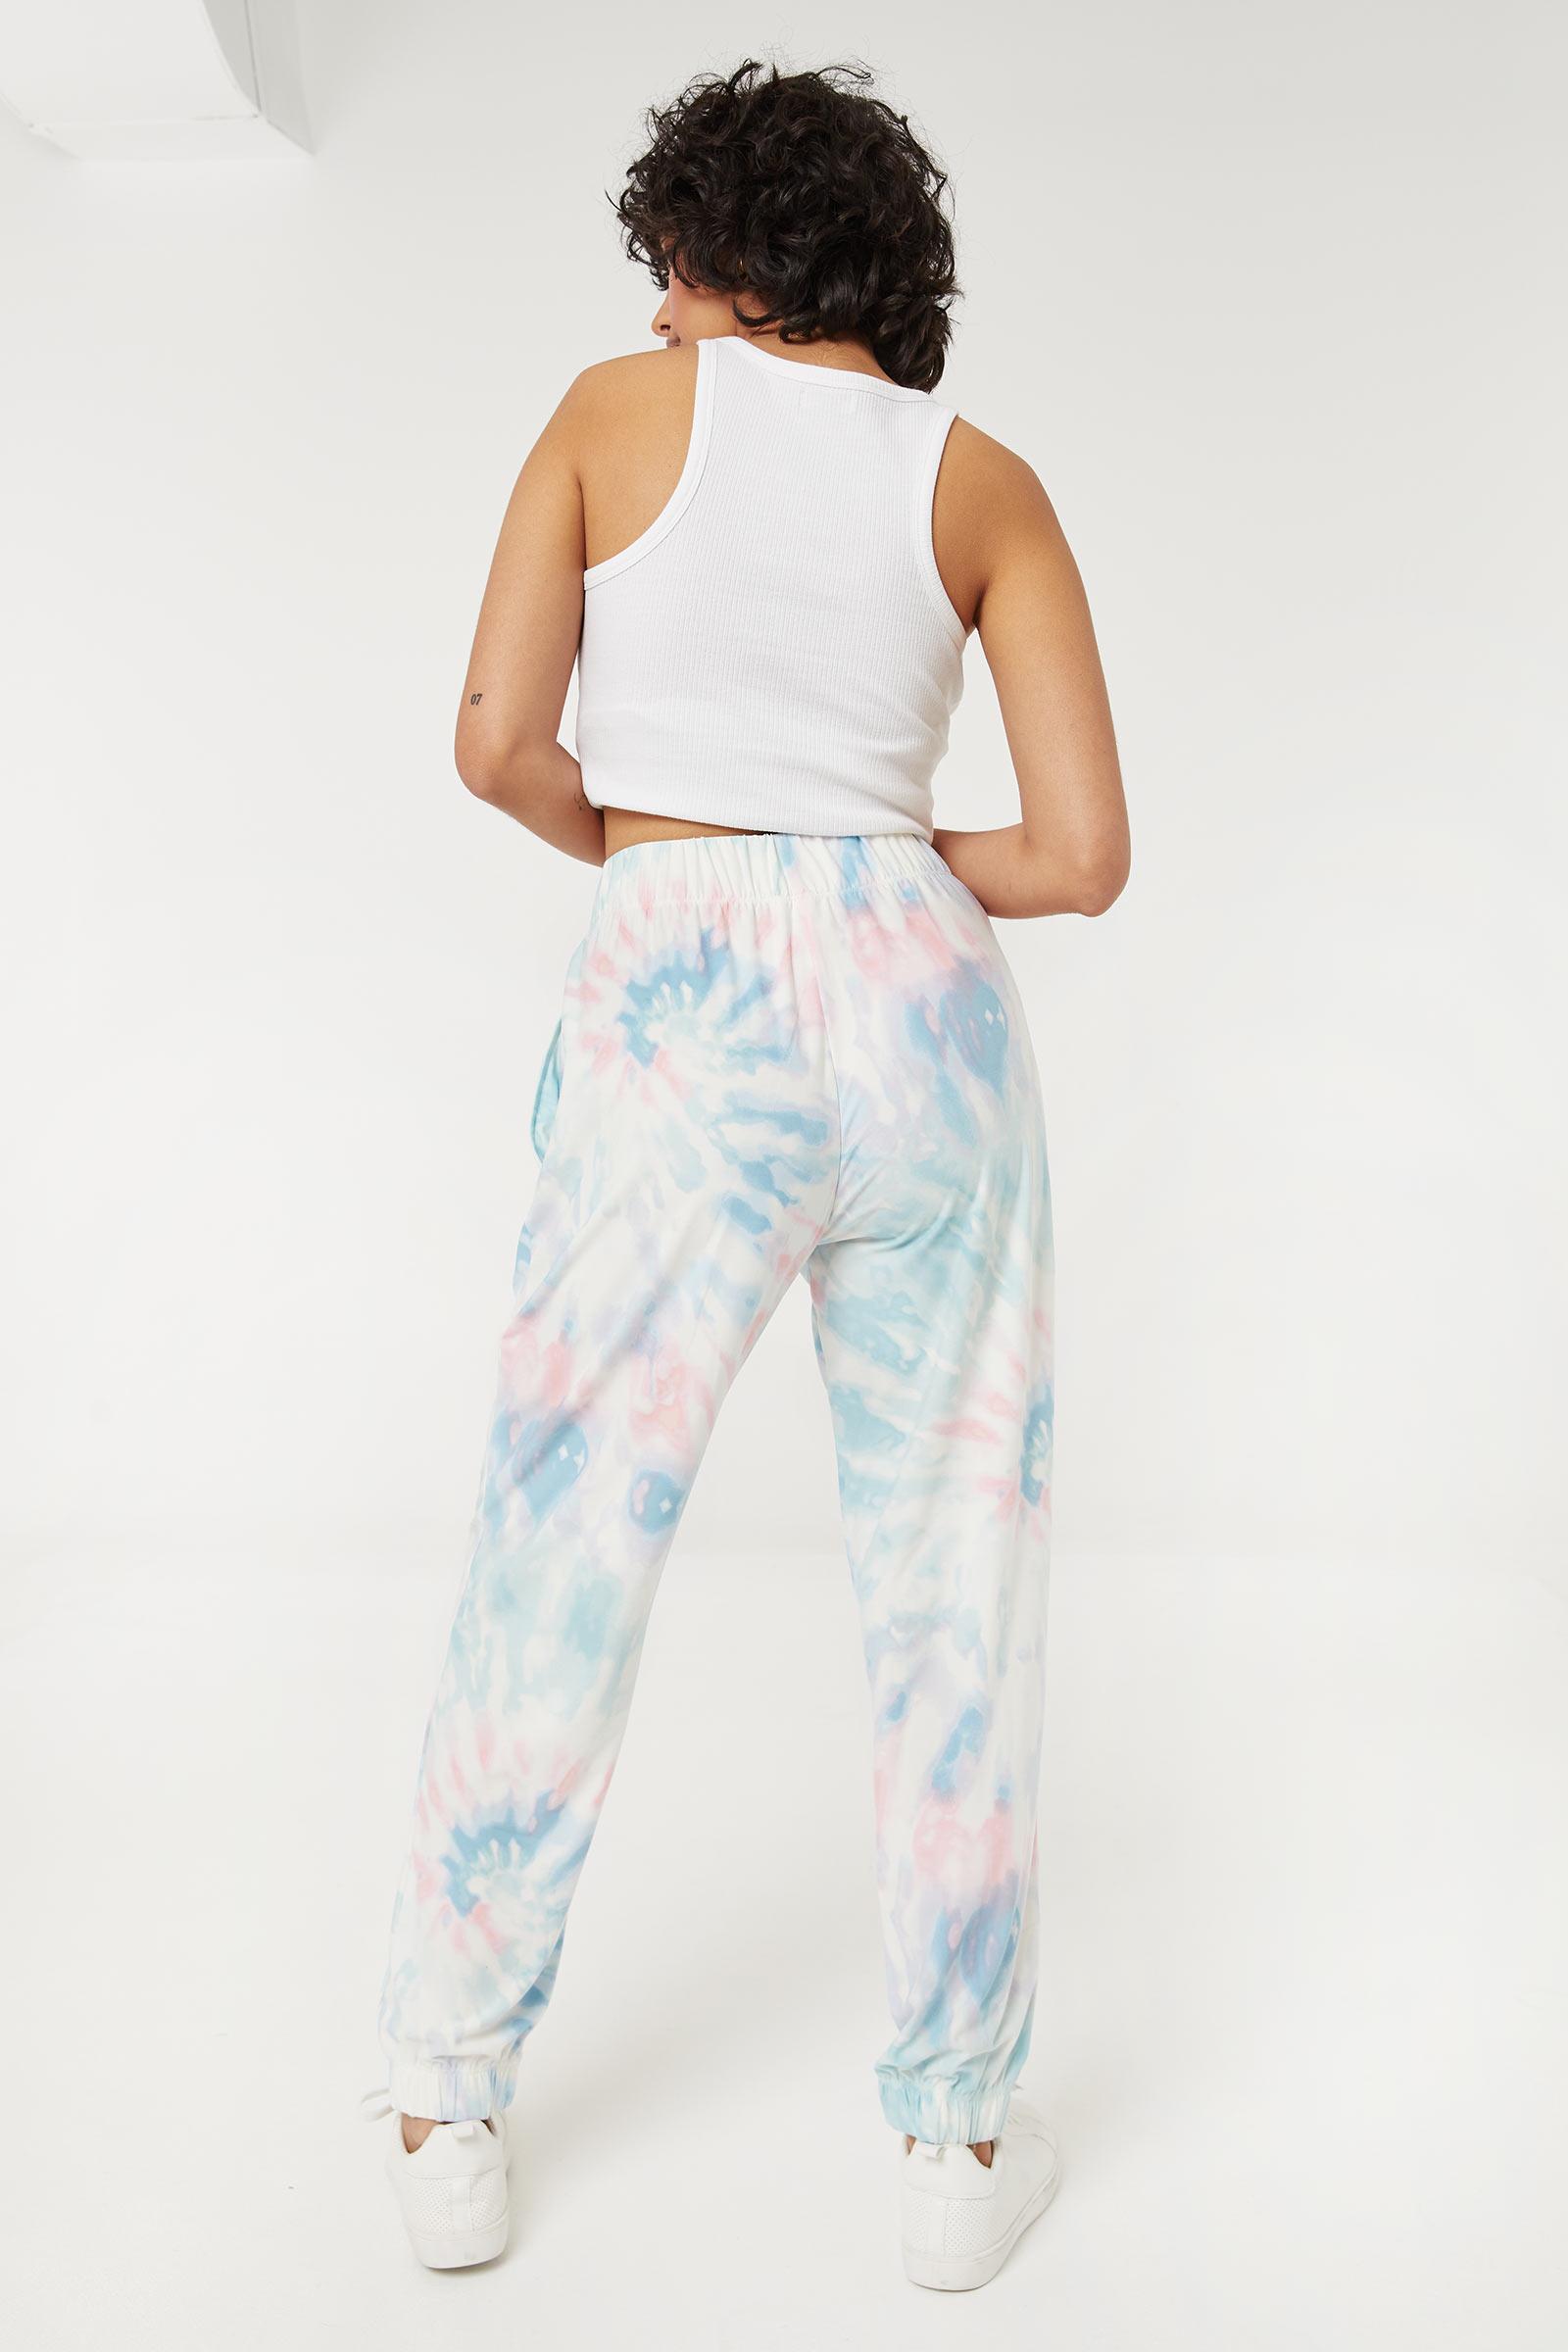 Super Soft Tie-Dye Joggers